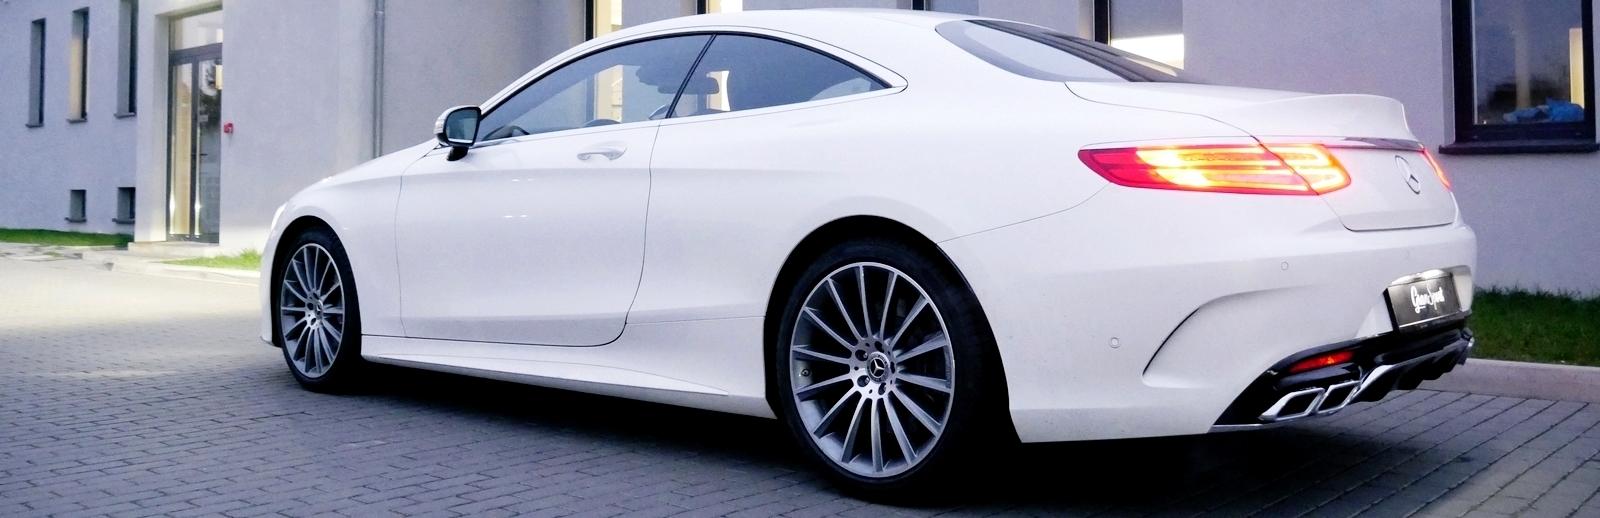 Mercedes-Benz S 500 Coupe Brabus